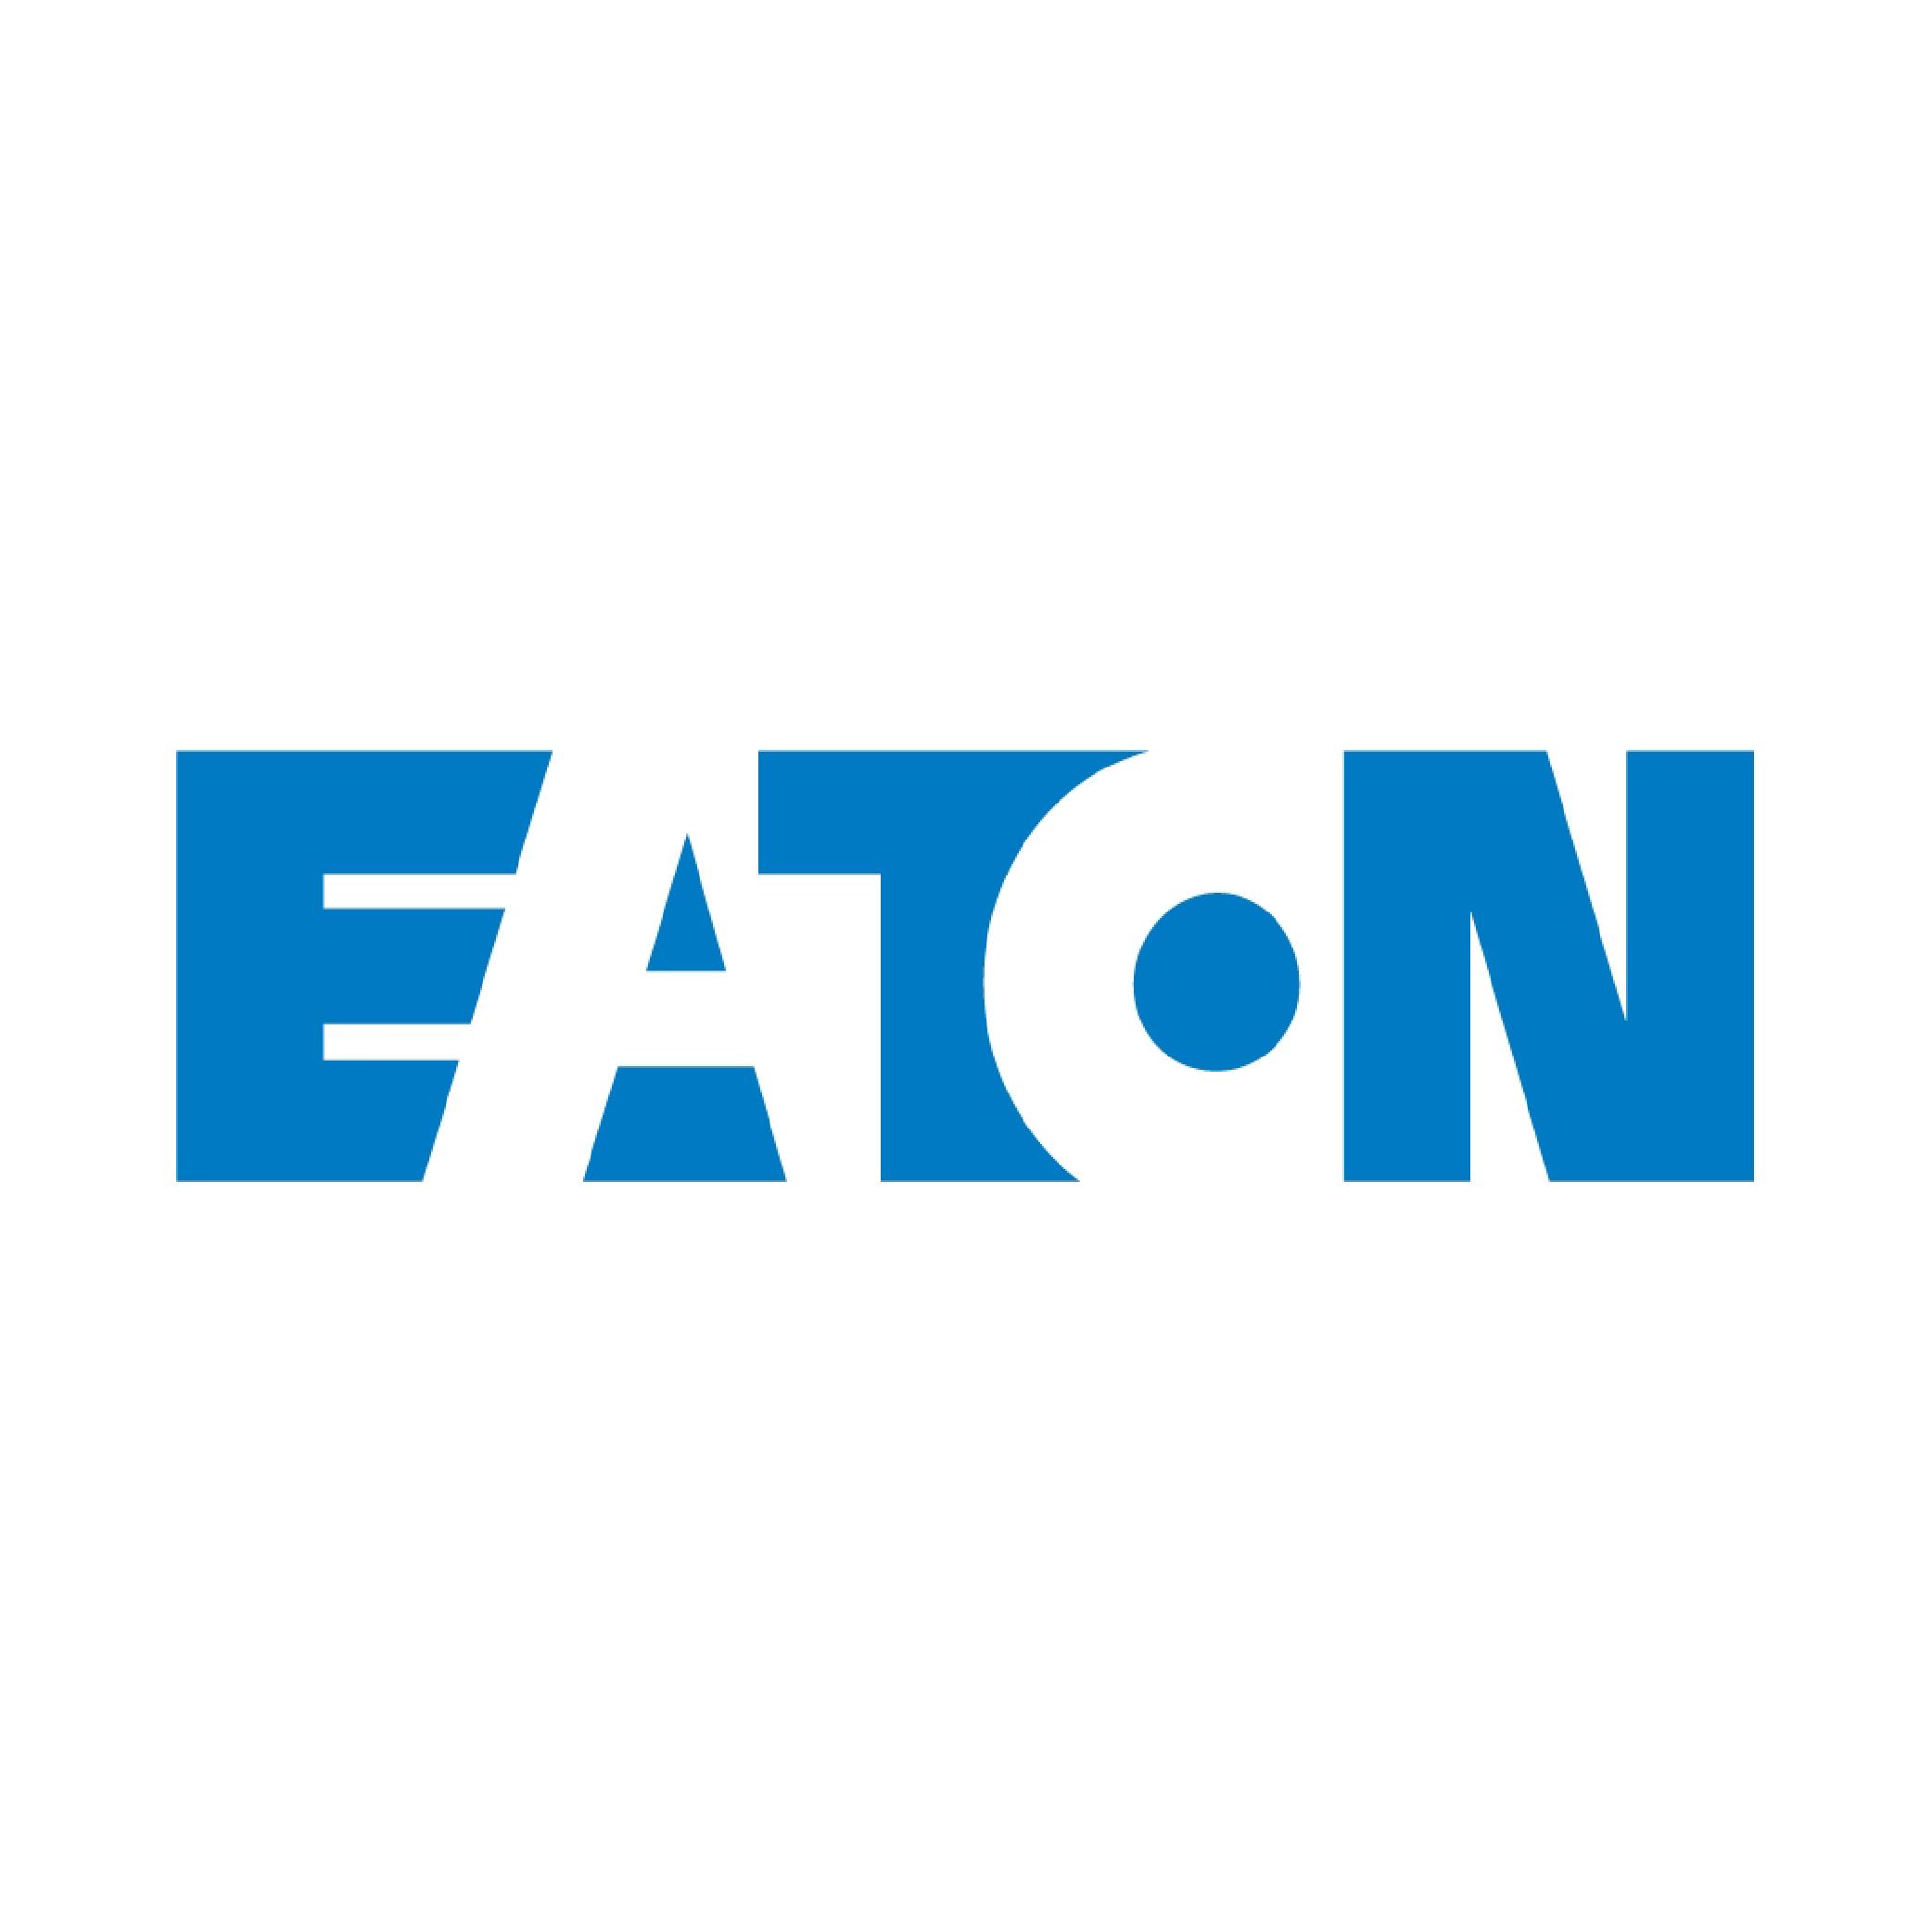 Copy of Eaton Corporation